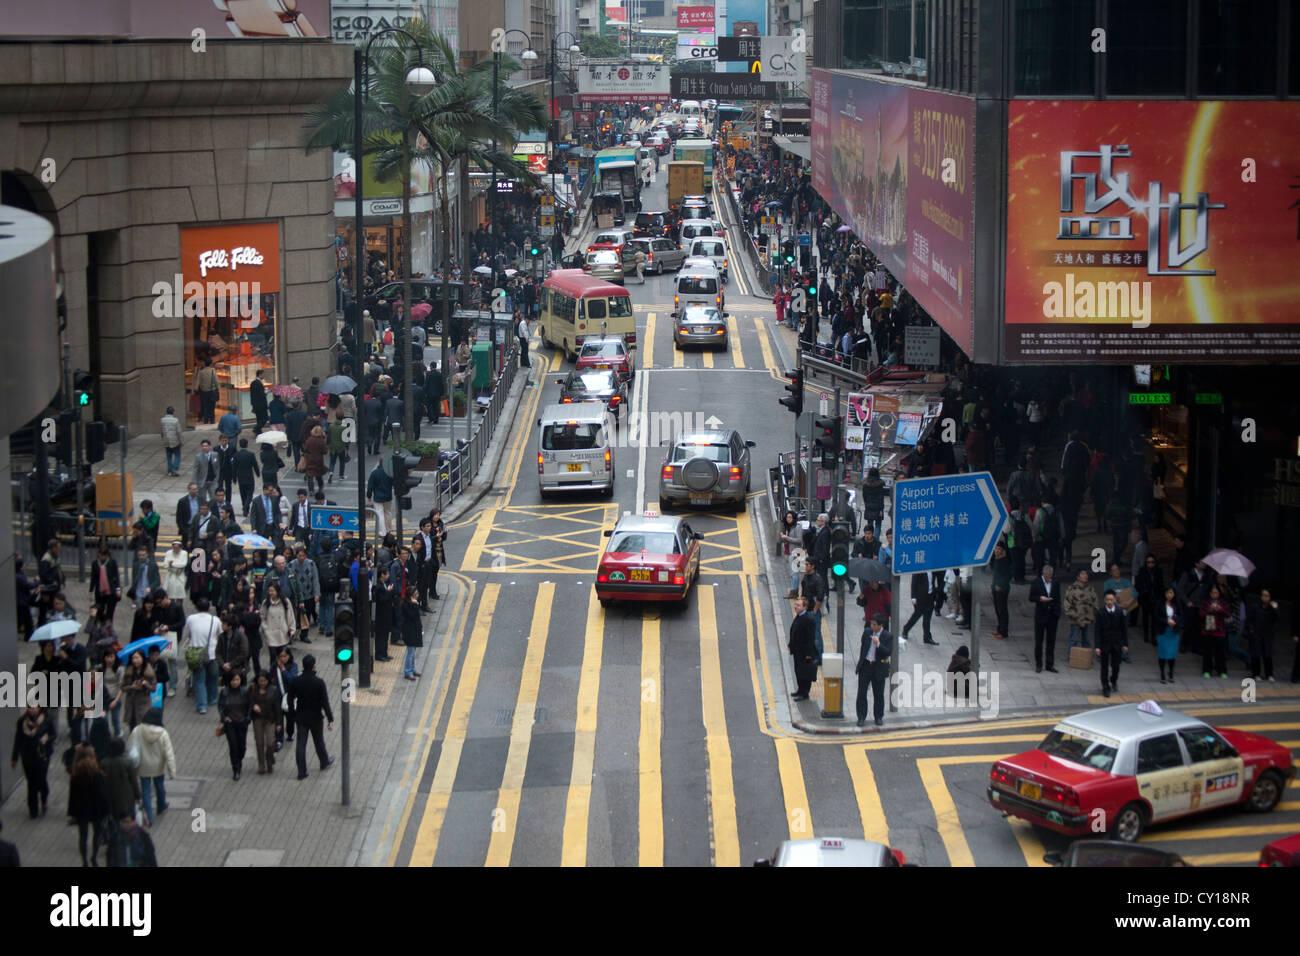 metropole centre China urban chinese town hongkong - Stock Image